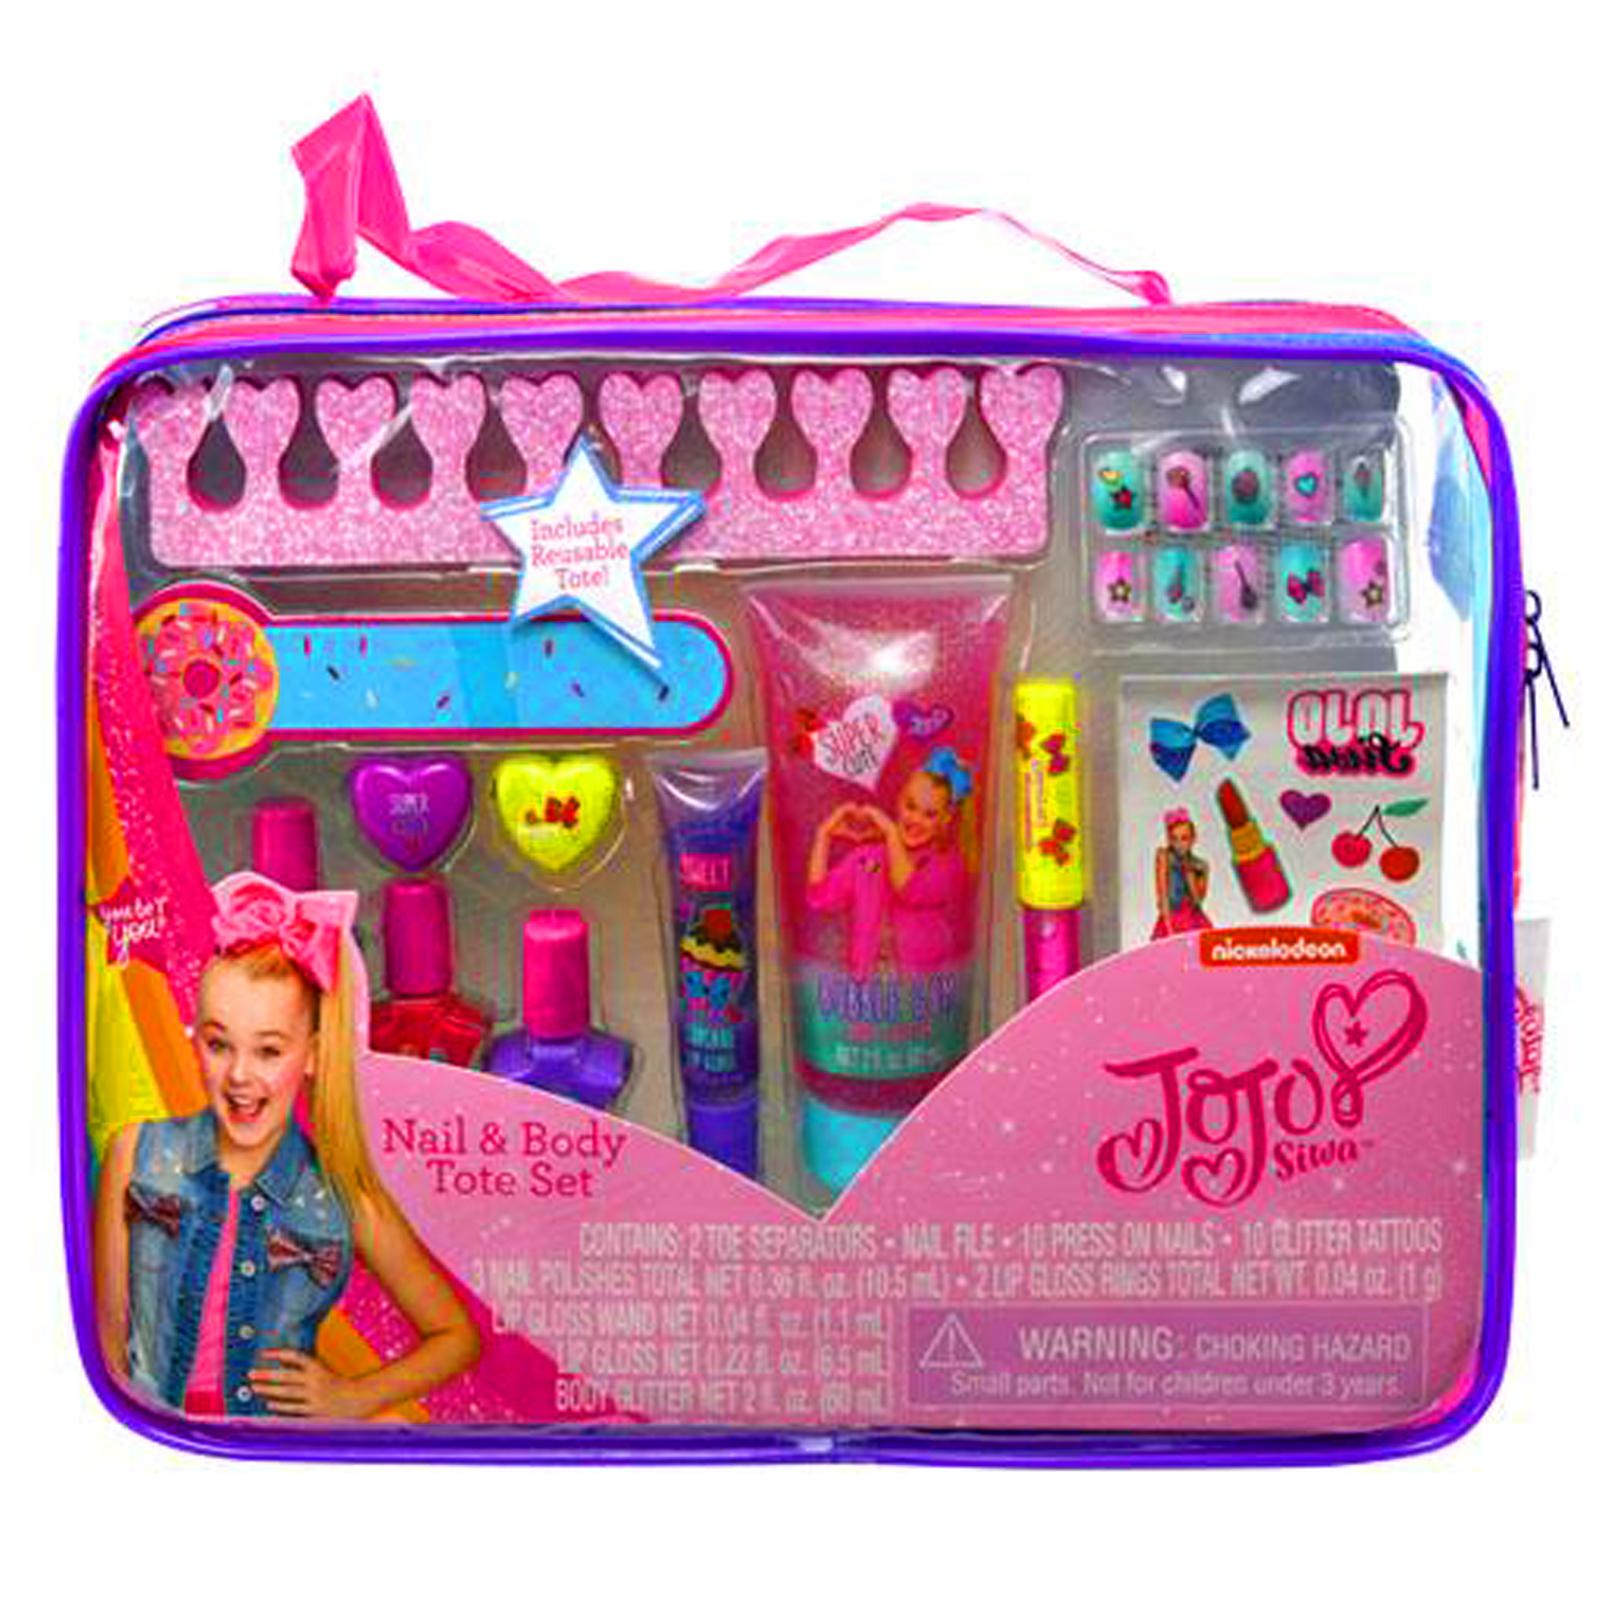 JoJo Siwa Girls Nail and Body Cosmetics Gift Set Tote Bag